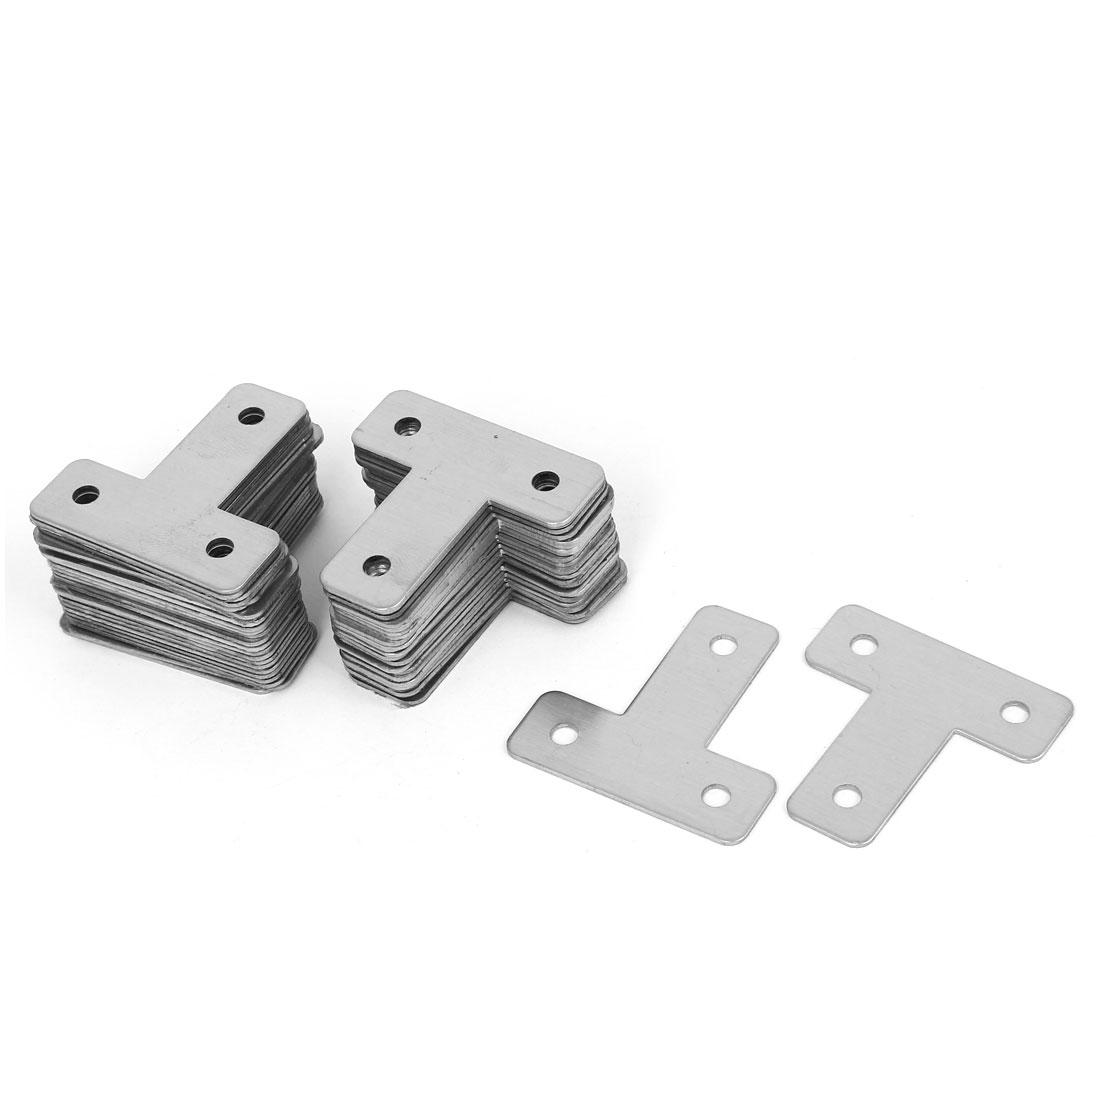 40mmx40mm T Shaped Metal Flat Plate Corner Brace Angle Bracket Support 50pcs